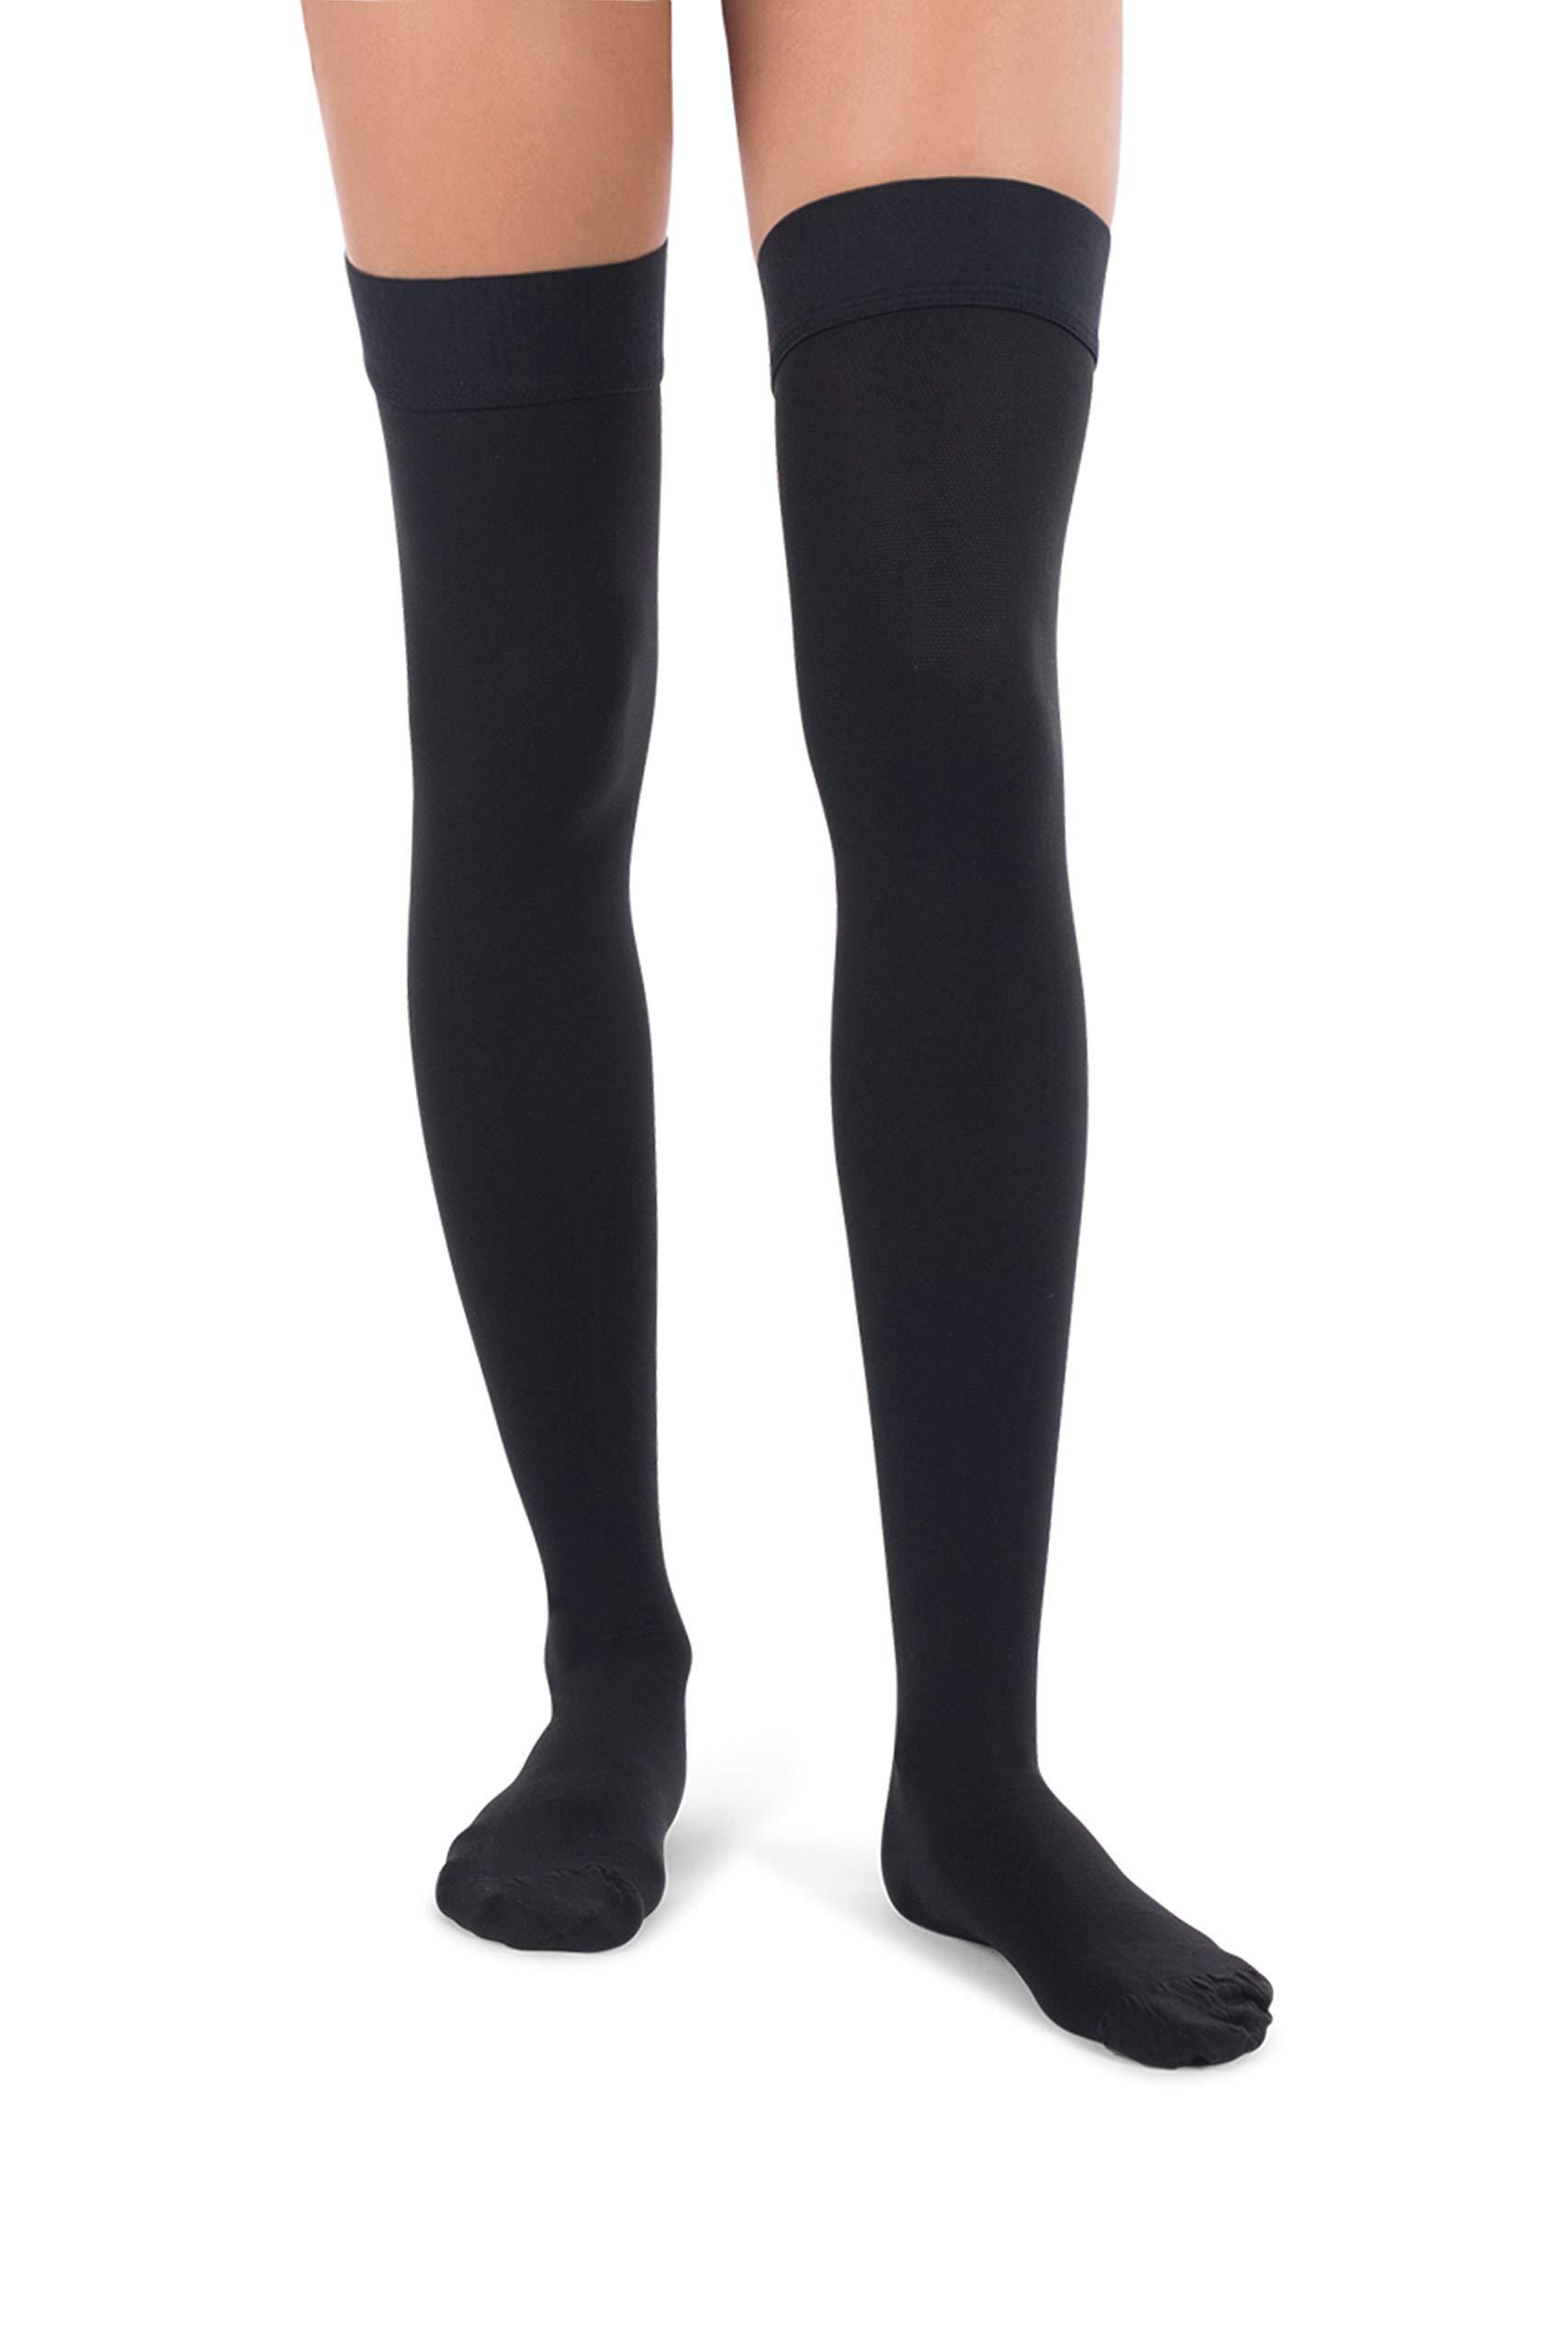 2615fd5cc45 Amazon.com  Jomi Compression Thigh High Stockings Collection